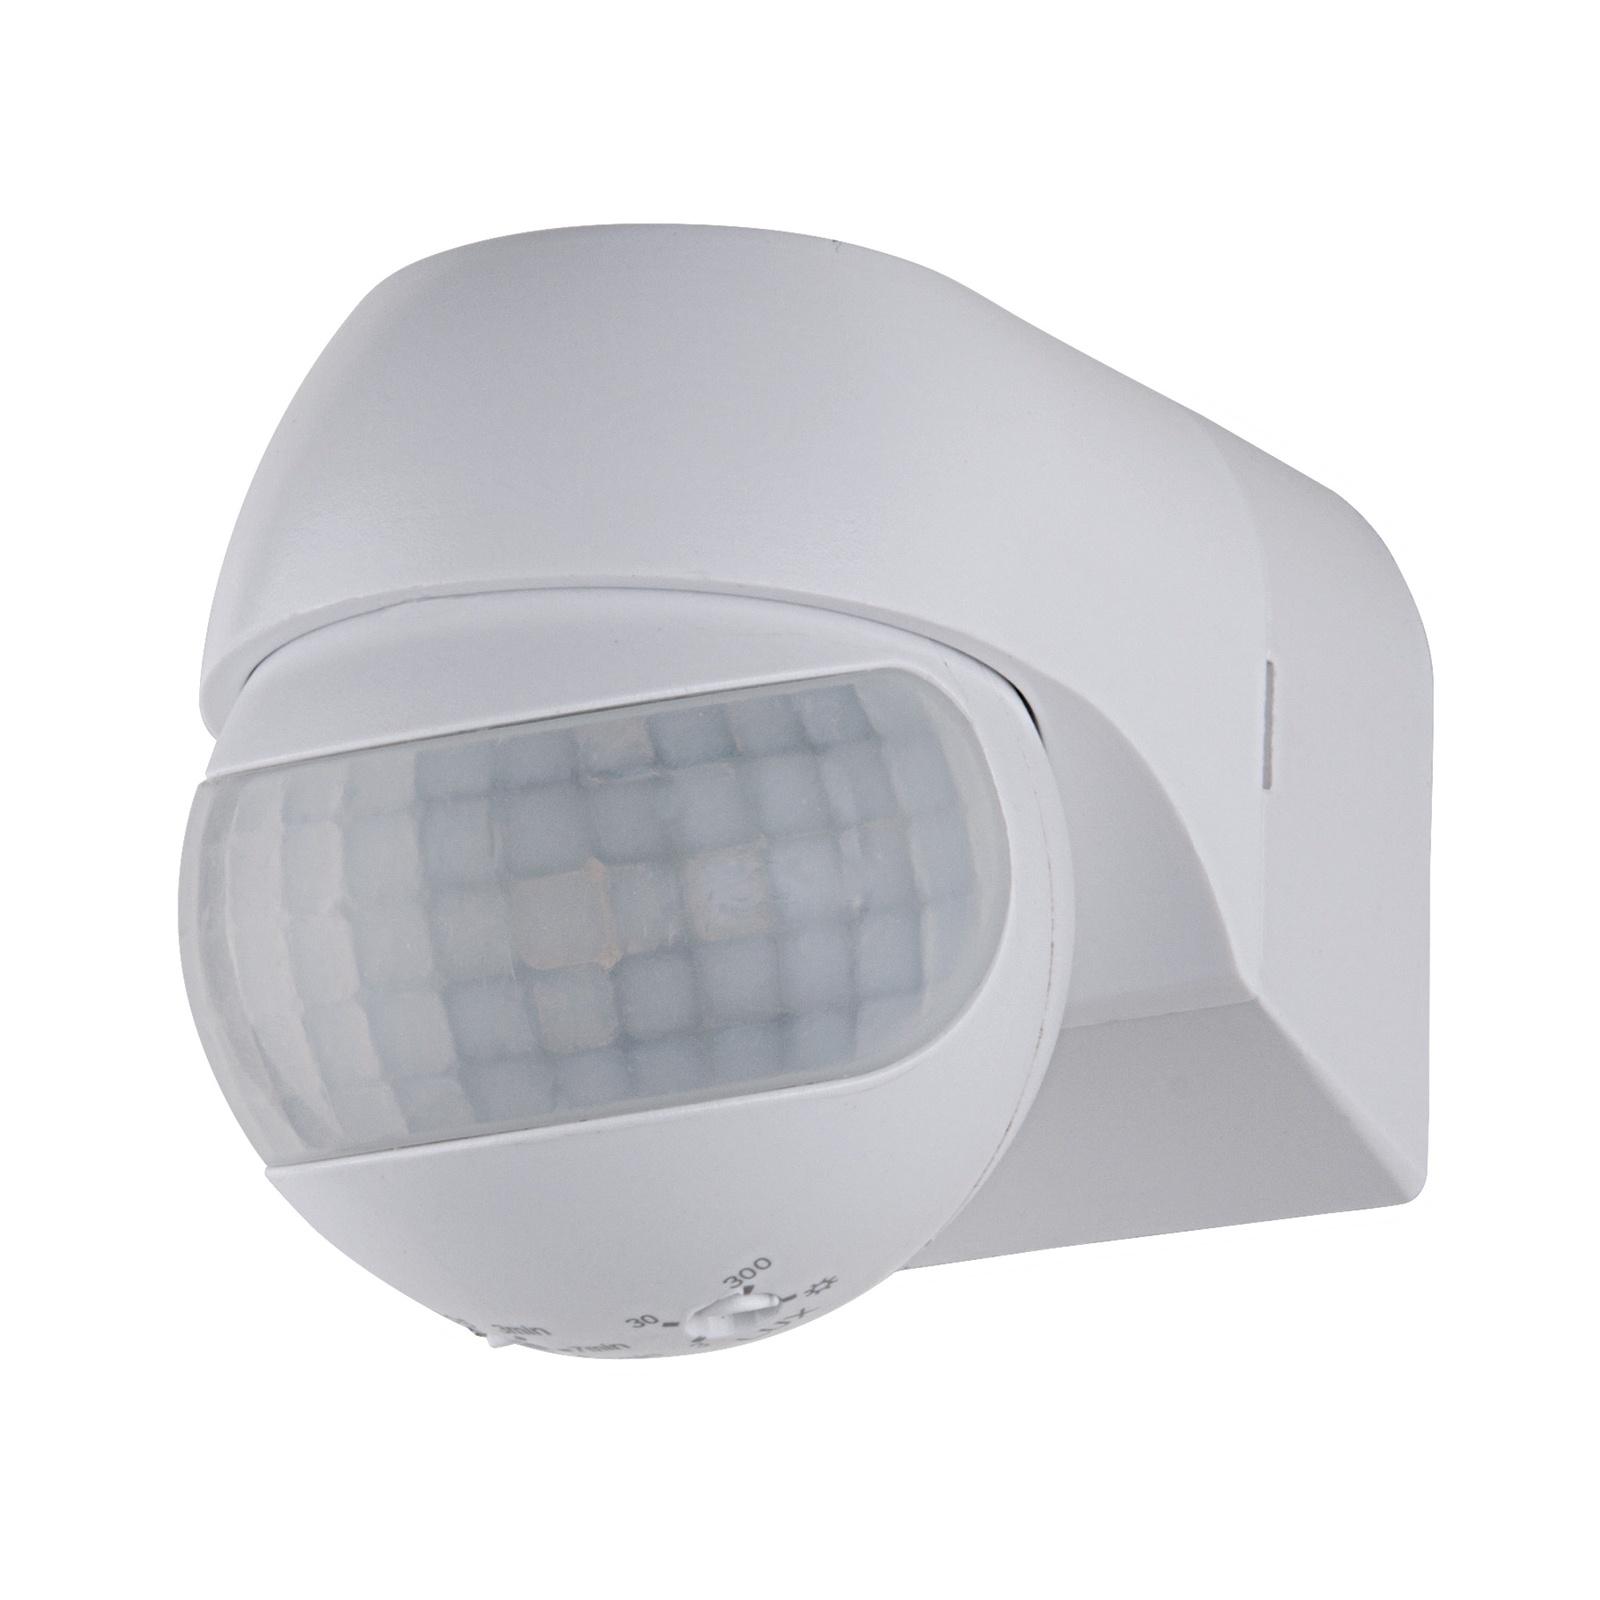 SNS-M-10 12m 1,8-2,5m 800W IP44 180 / датчик движения / Белый